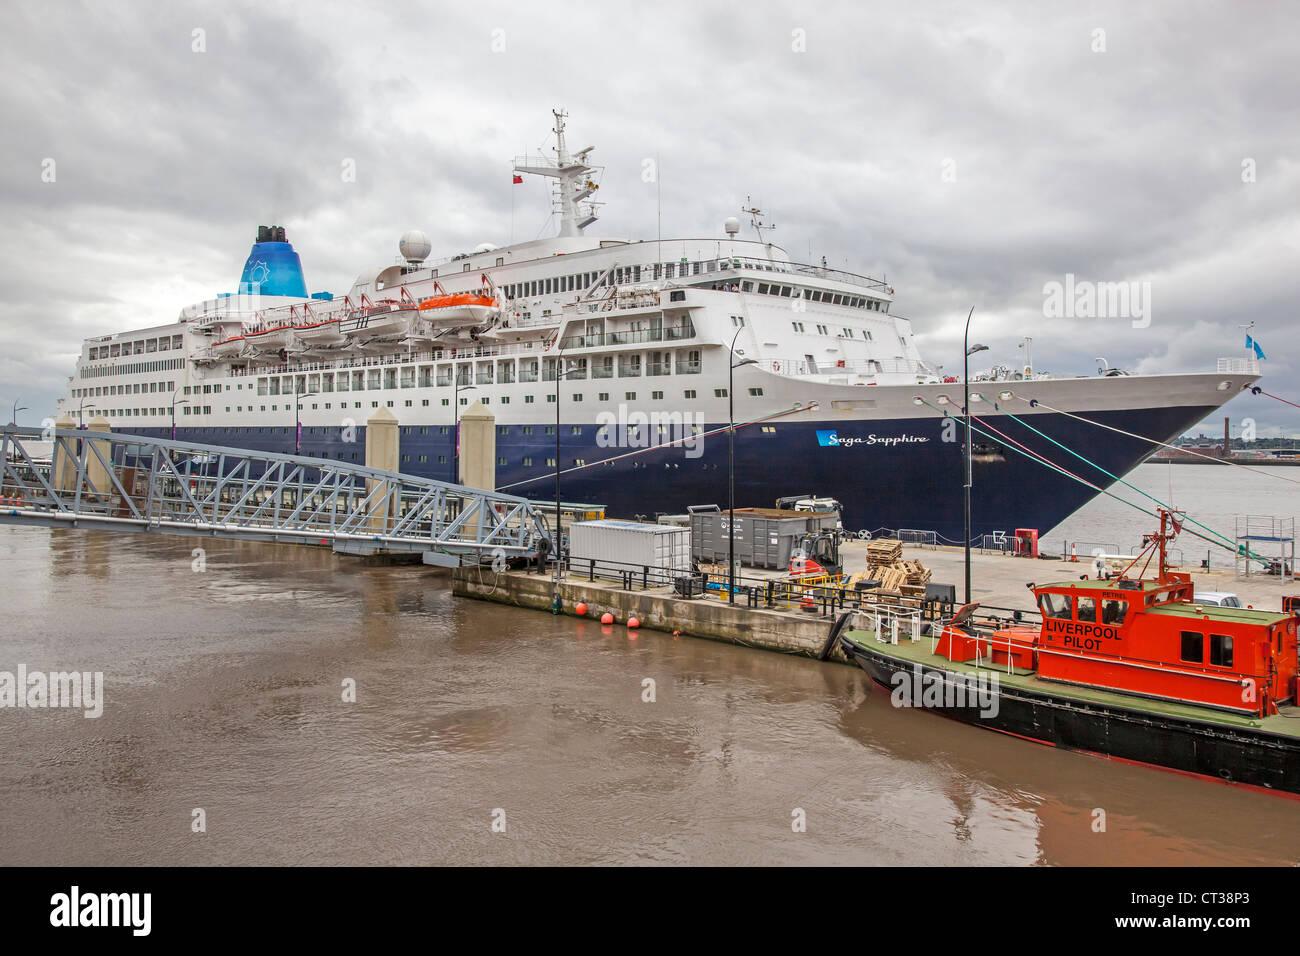 Cruise ship liner Saga Sapphire at Liverpool pierhead cruise terminal. - Stock Image